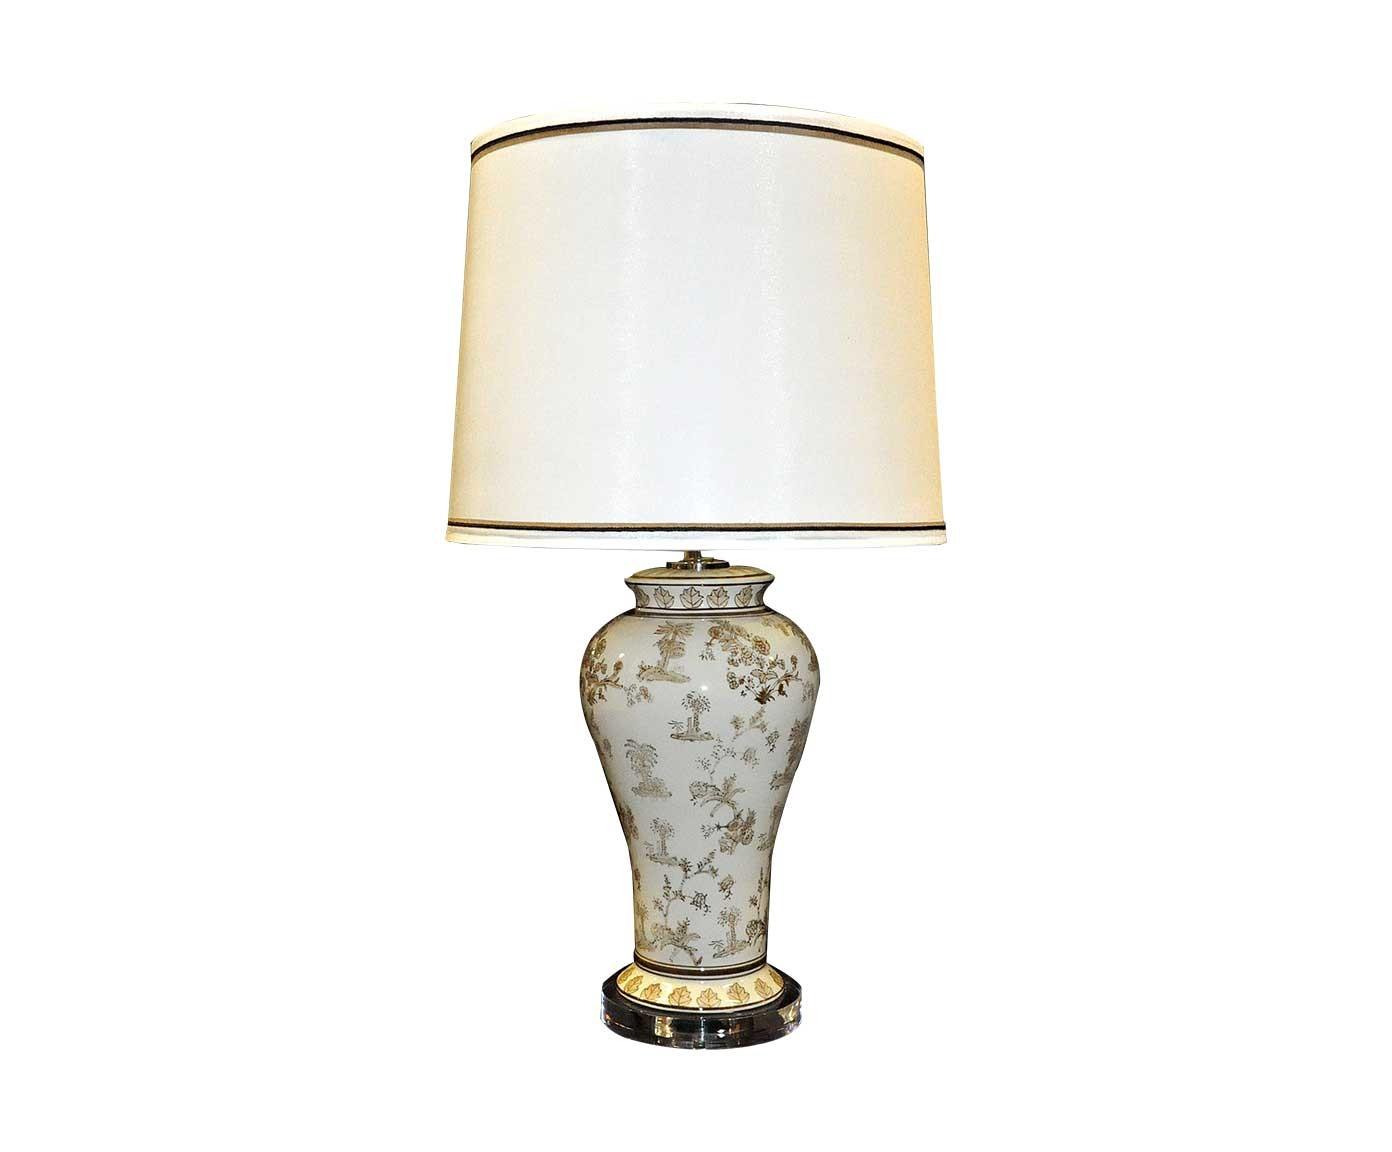 Lampe de style chinoise beige demeure et jardin for Lampe ambiance et style